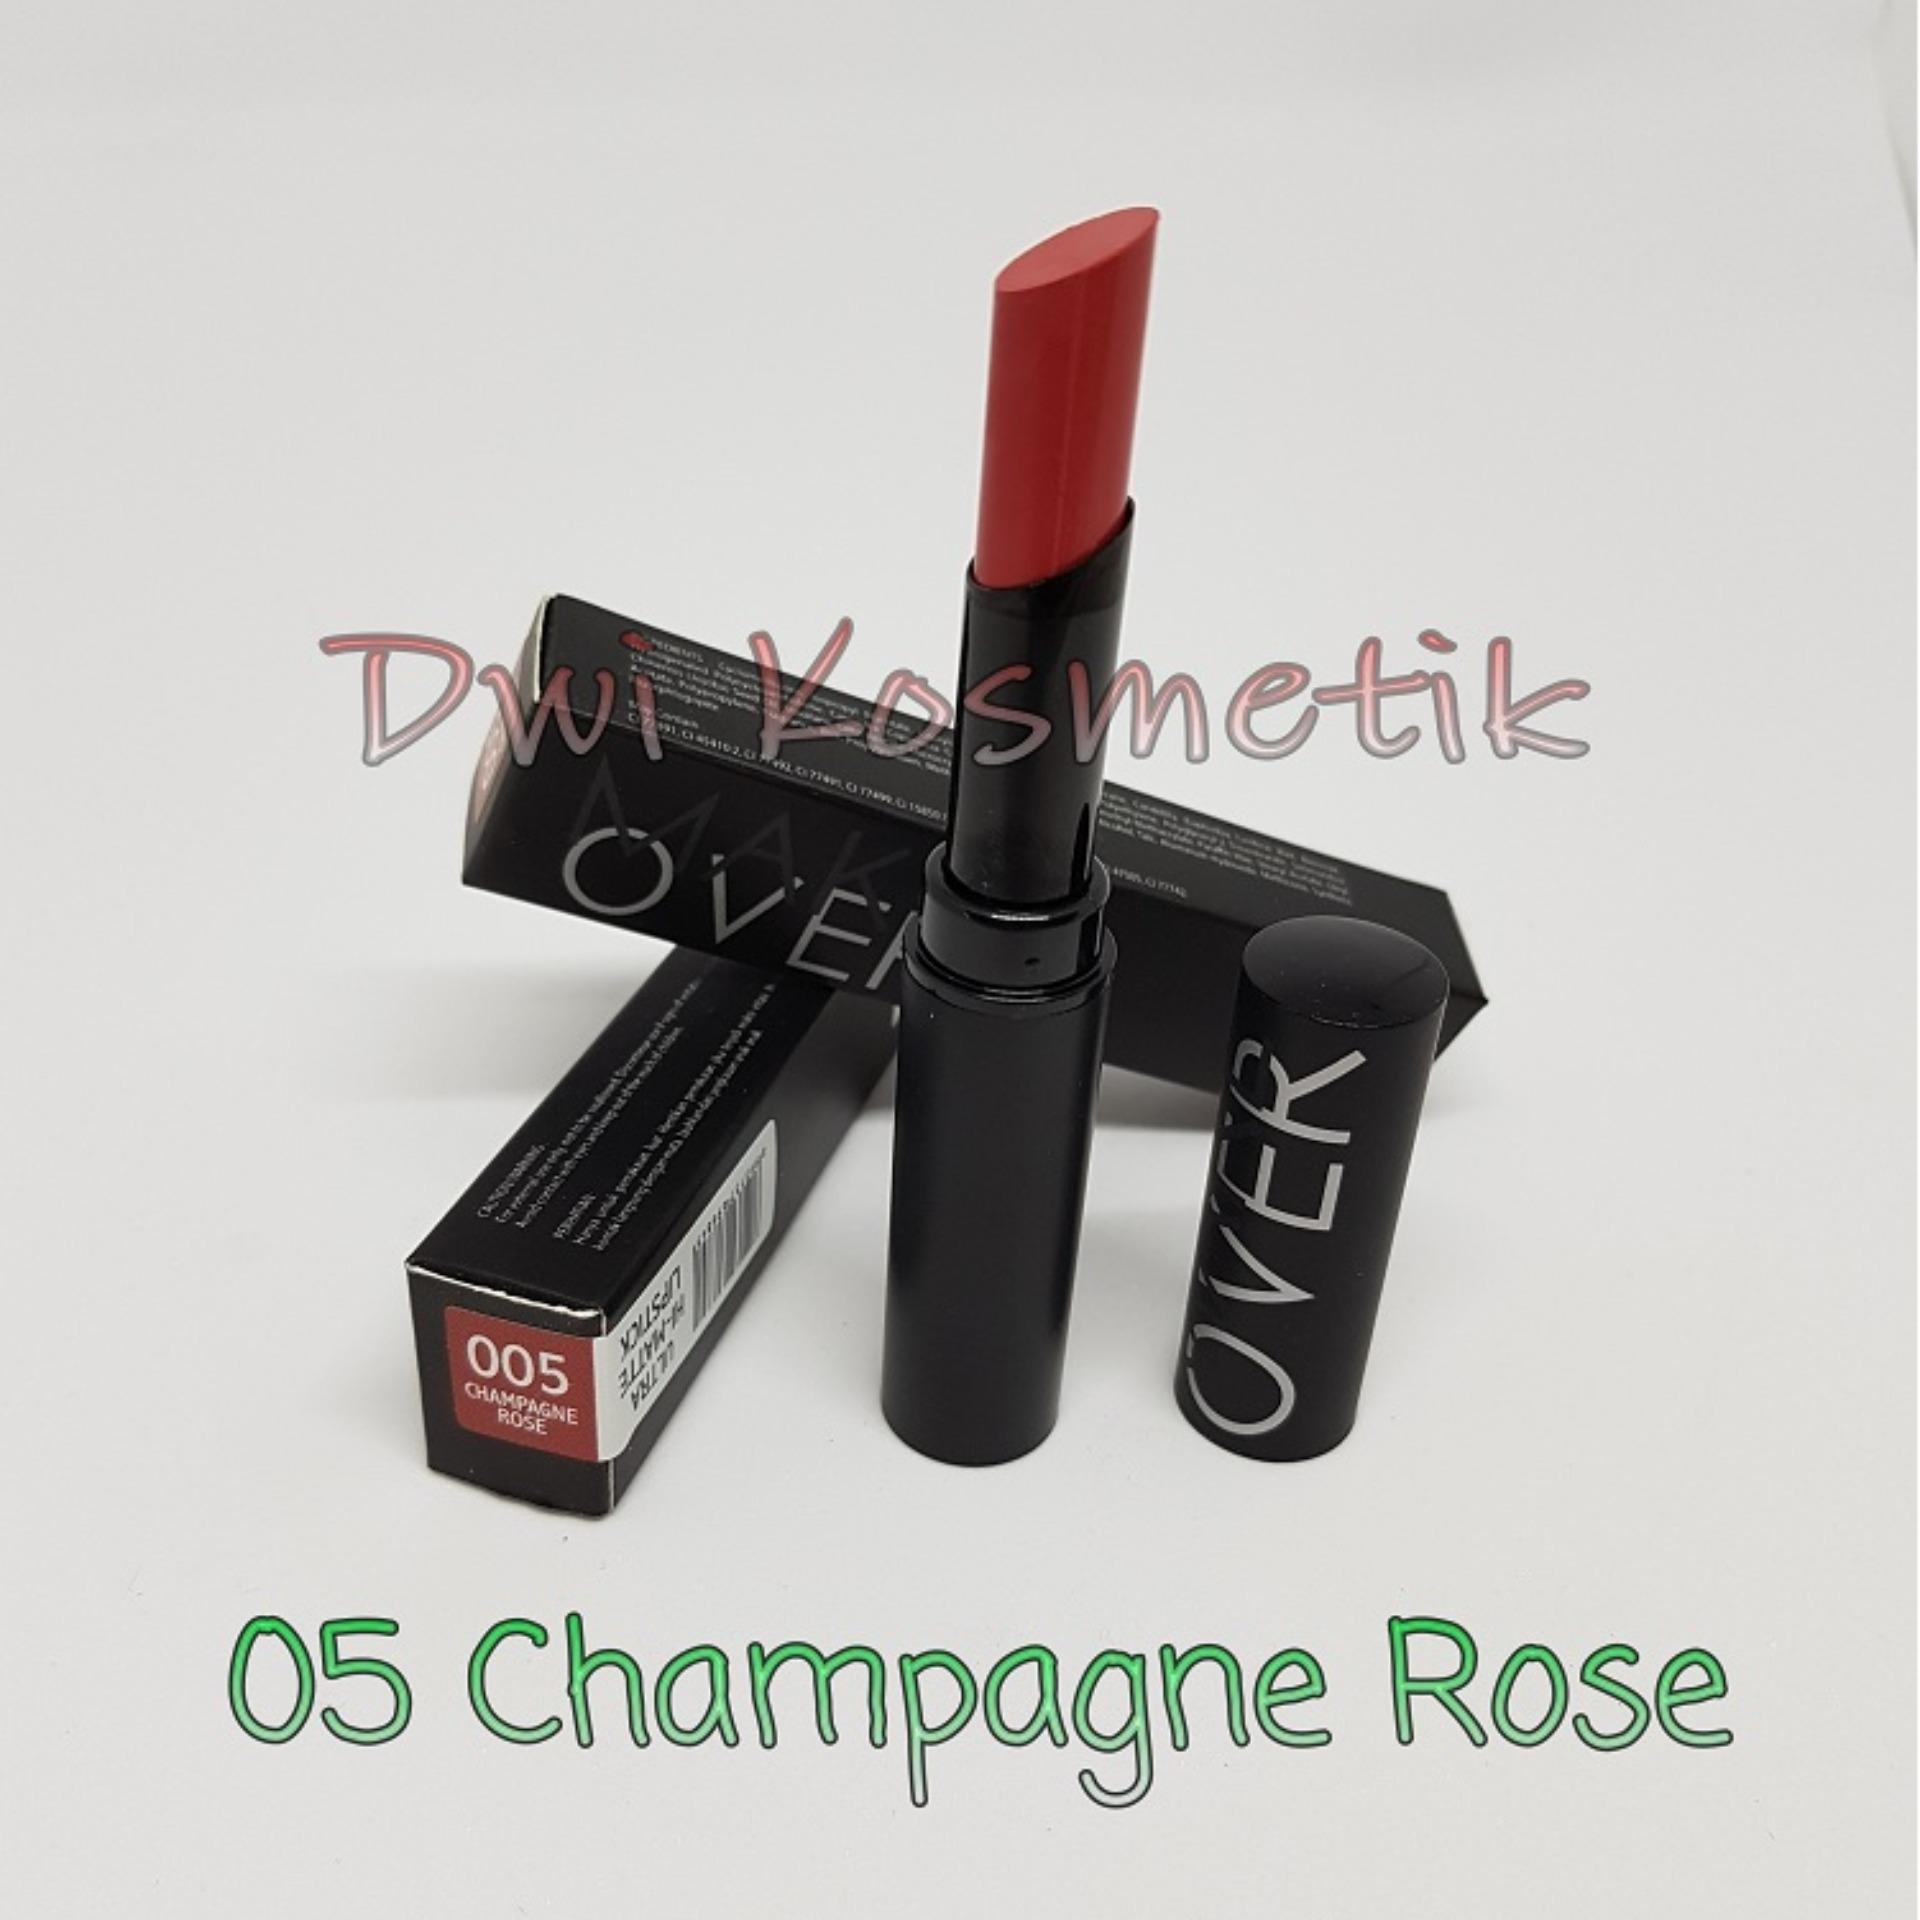 Beli Make Over Ultra Hi Matte Lipstik Online Terpercaya